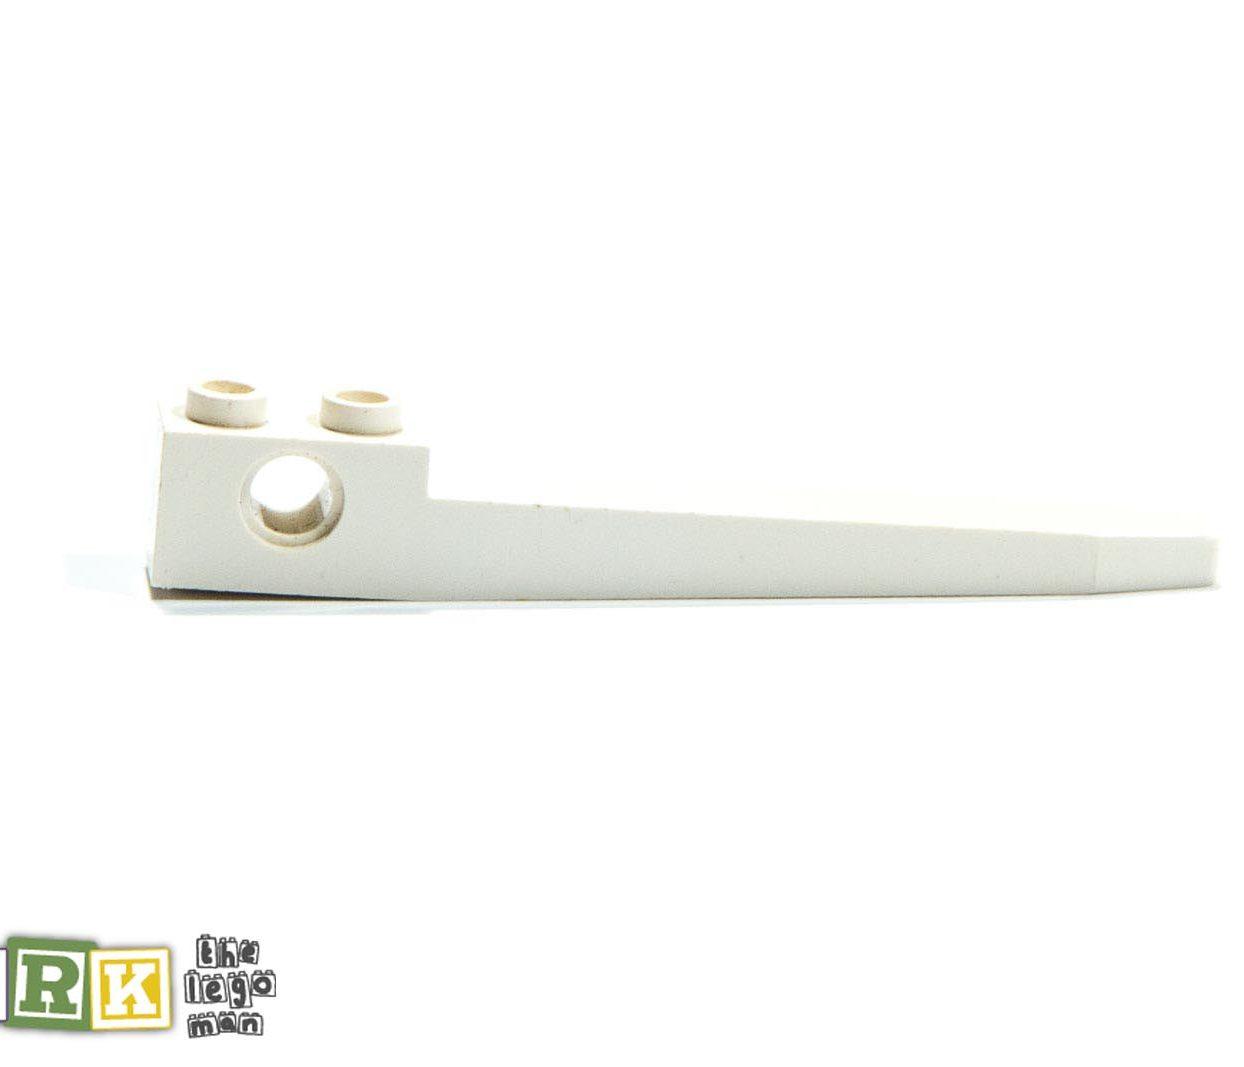 Lego 2823 2823 1x White Technic Fork